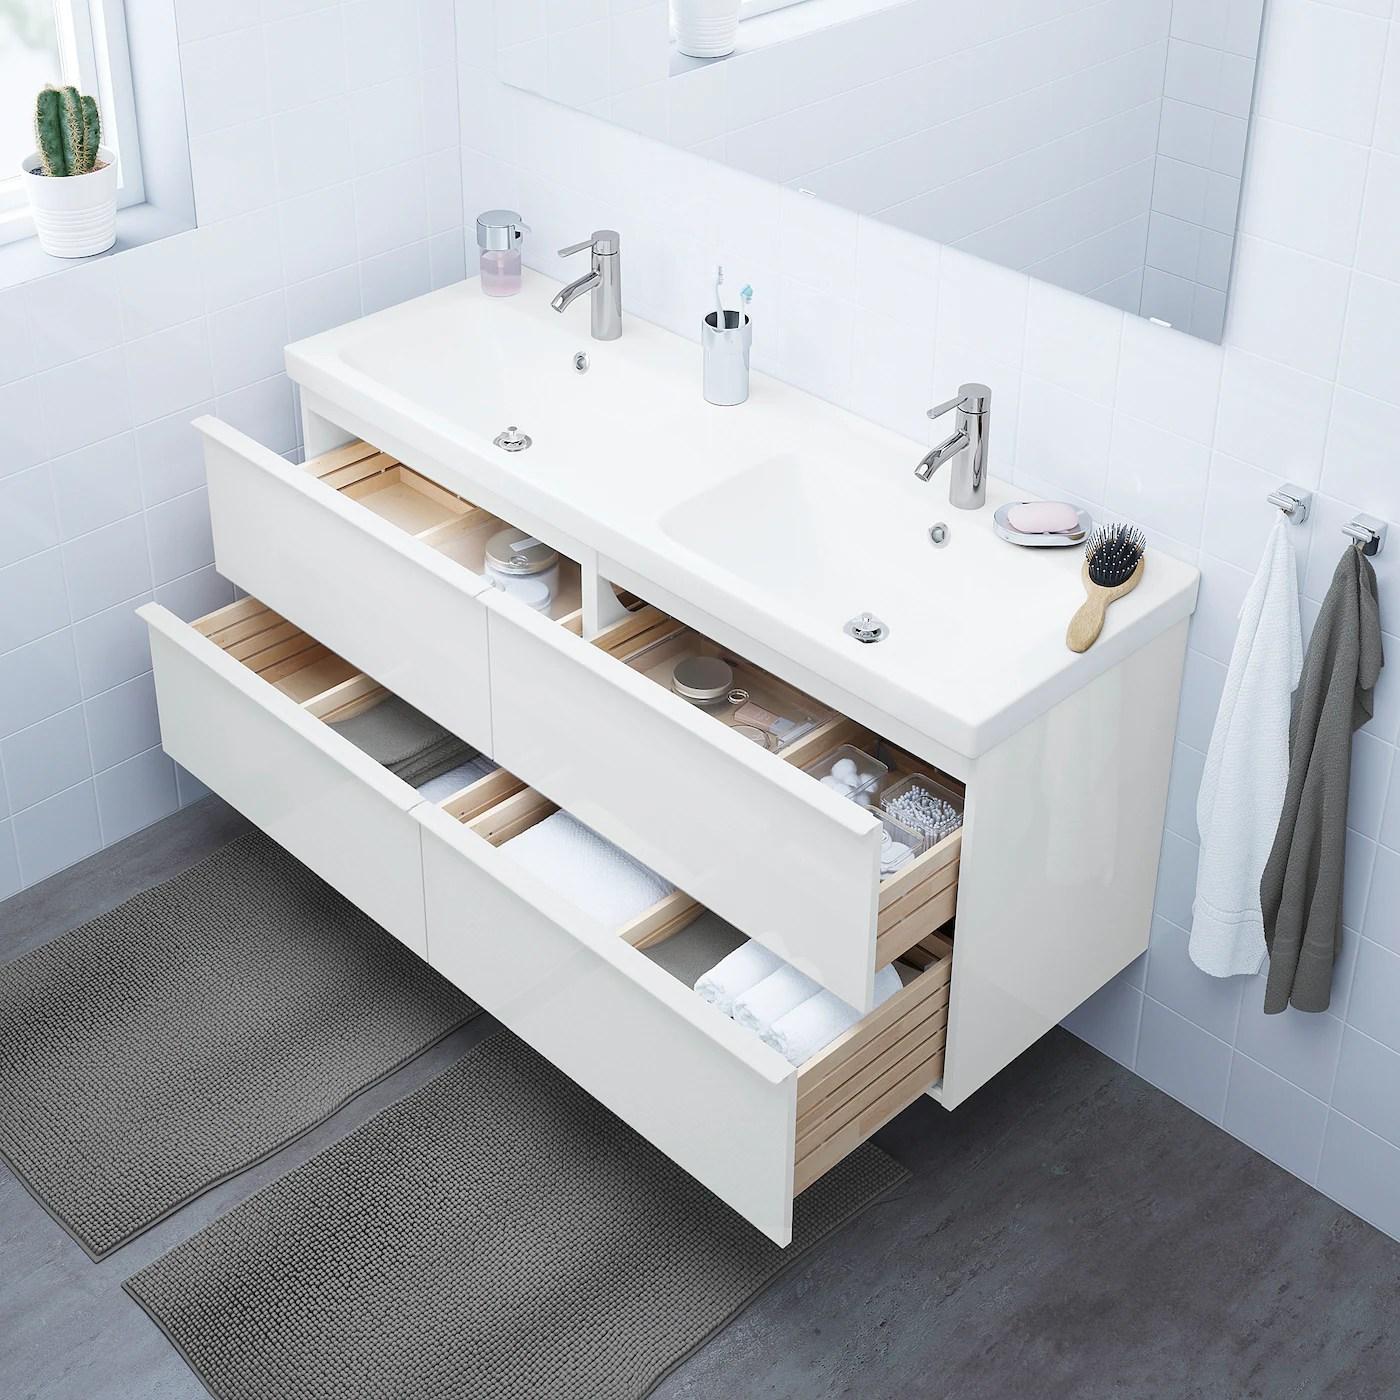 godmorgon bathroom vanity high gloss white 55 1 8x18 1 2x22 7 8 140x47x58 cm